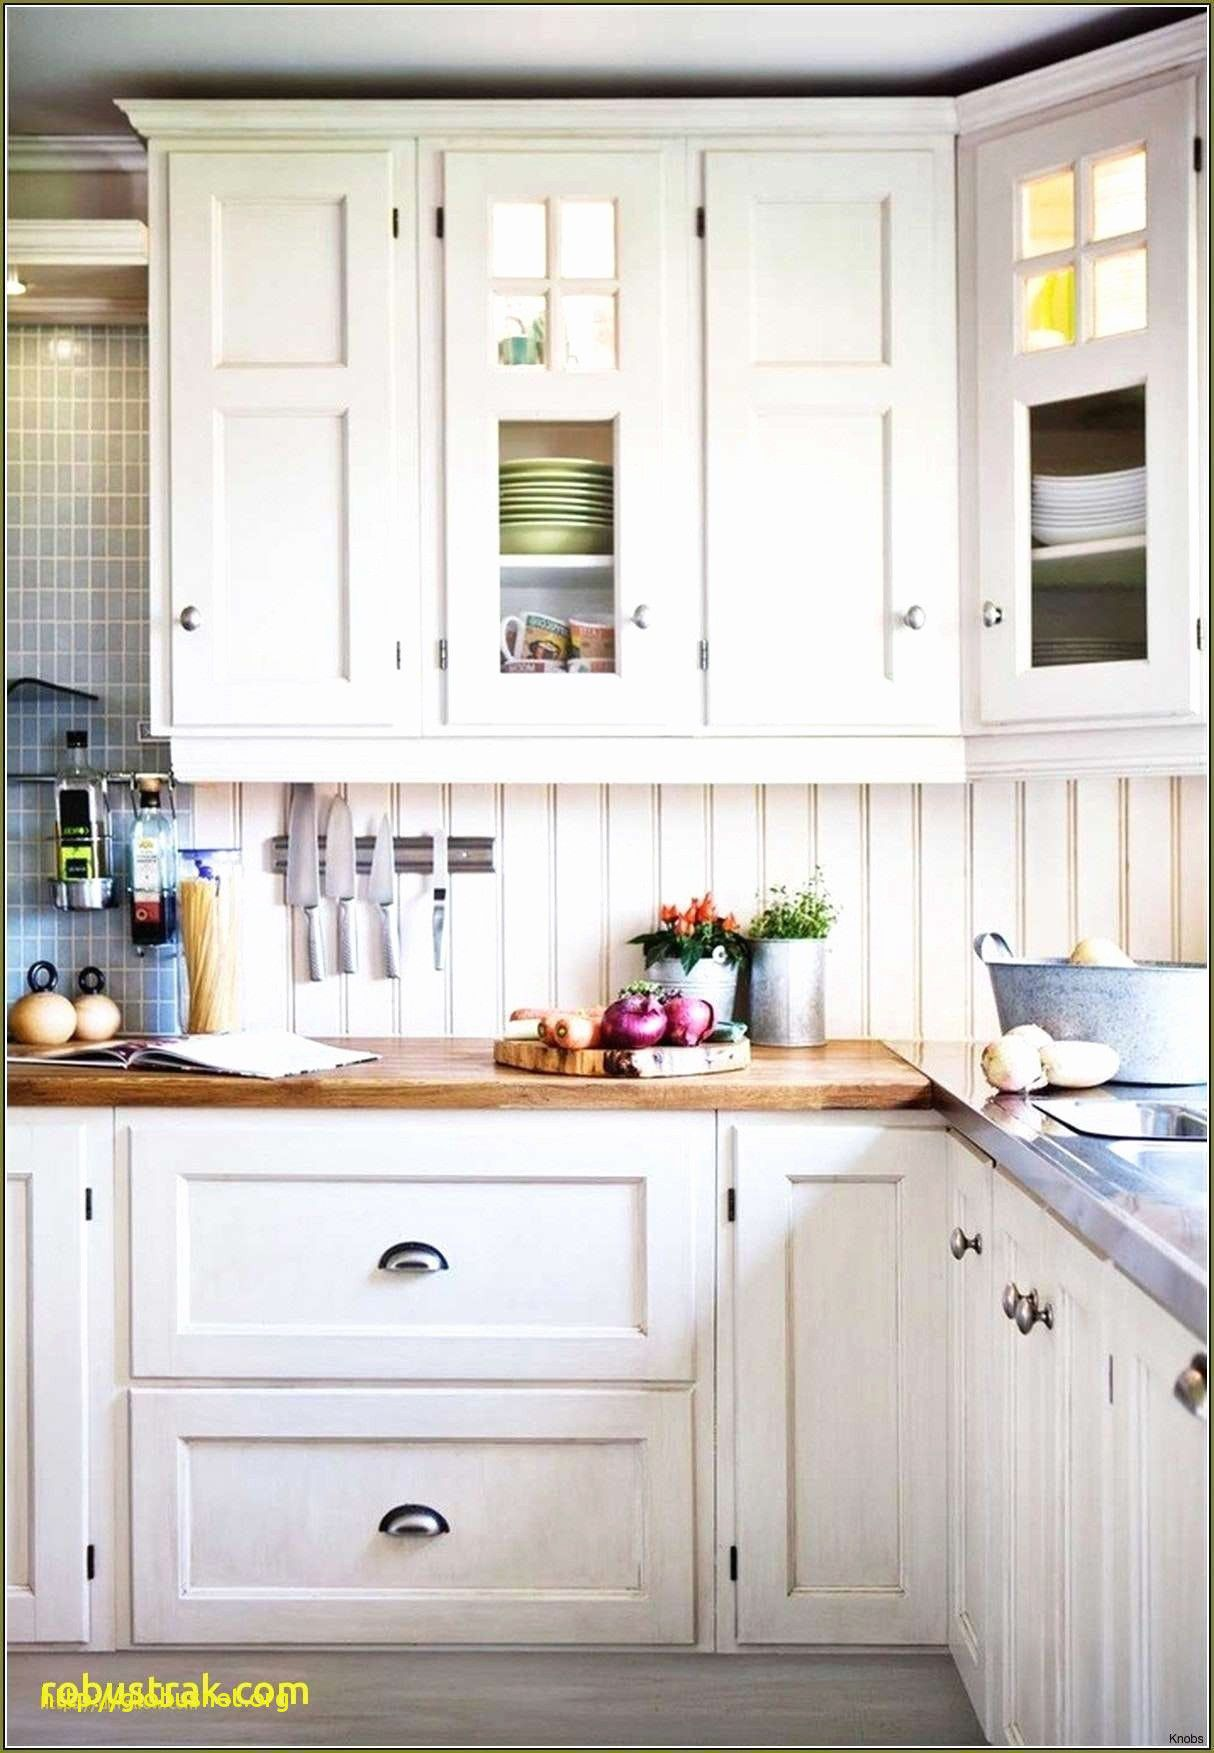 BeautifulInspirational Kitchen Drawer Hardware